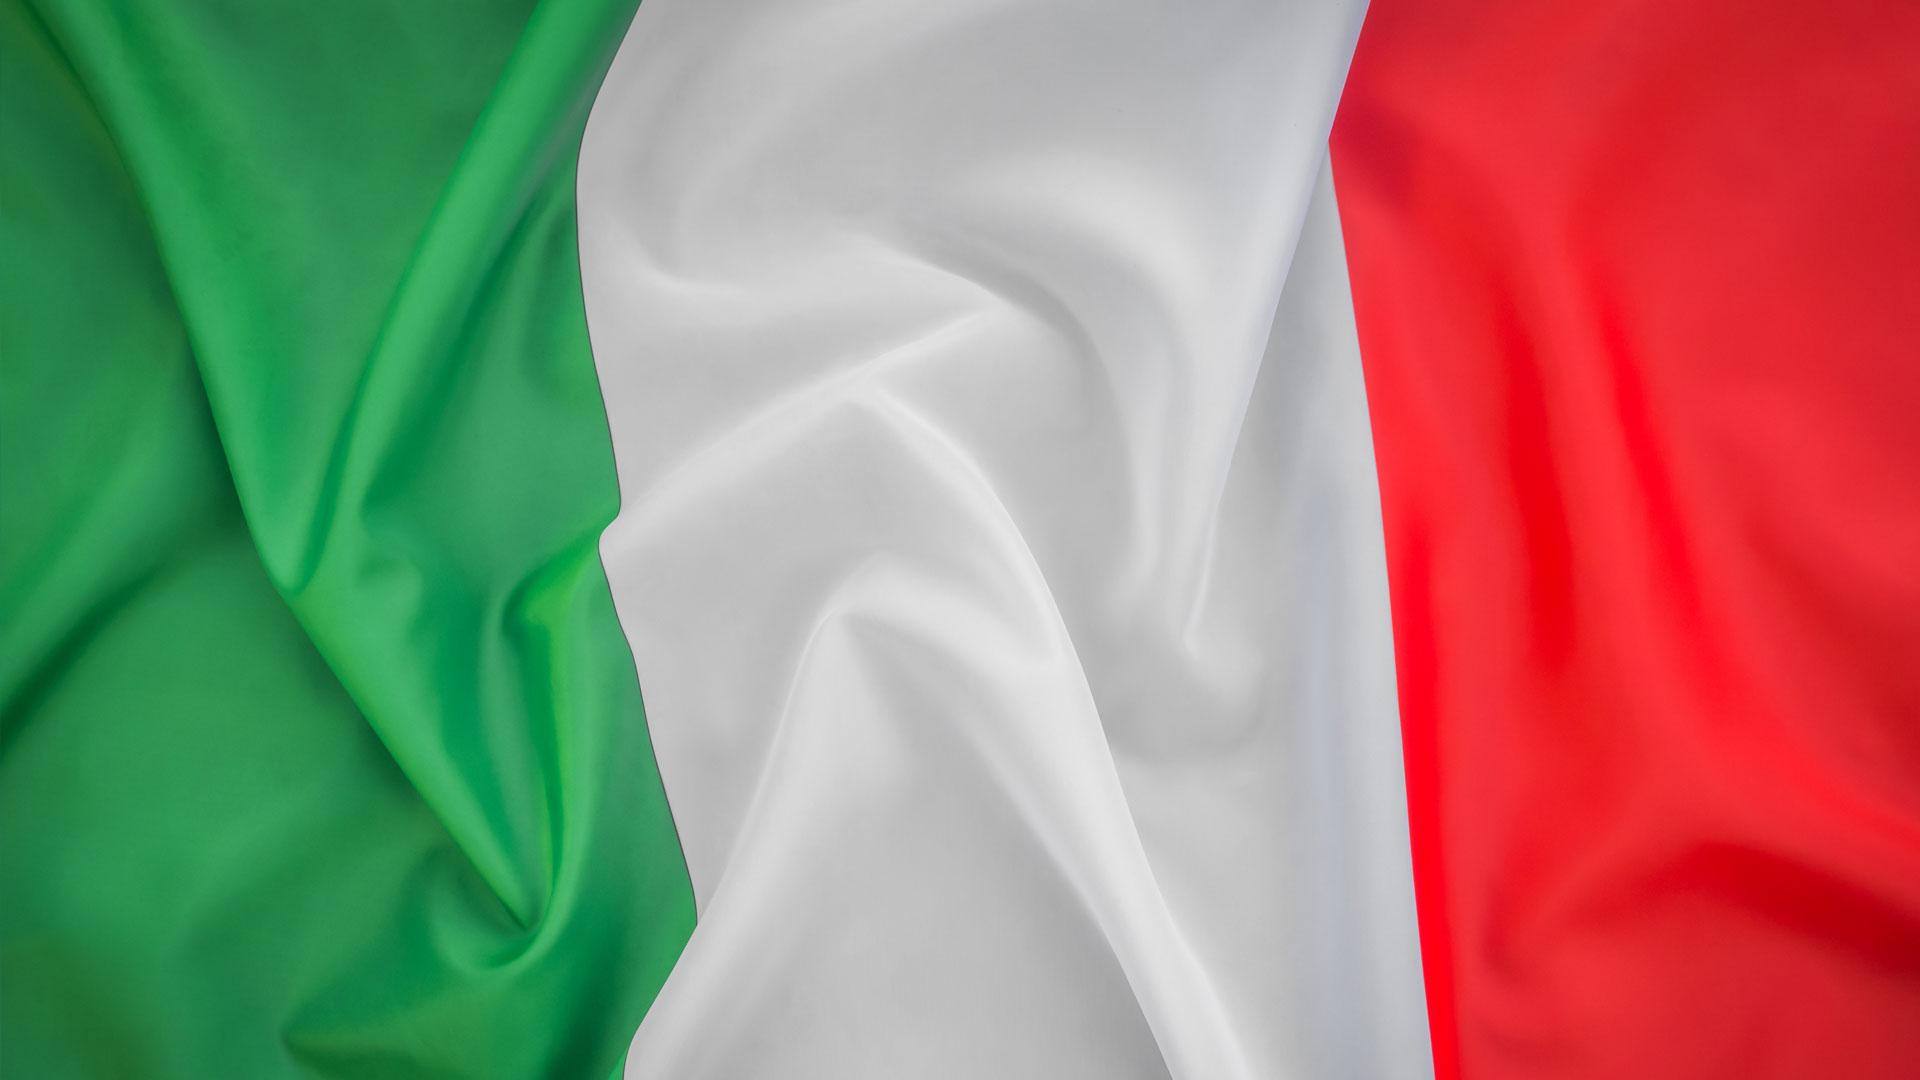 İtalyanca